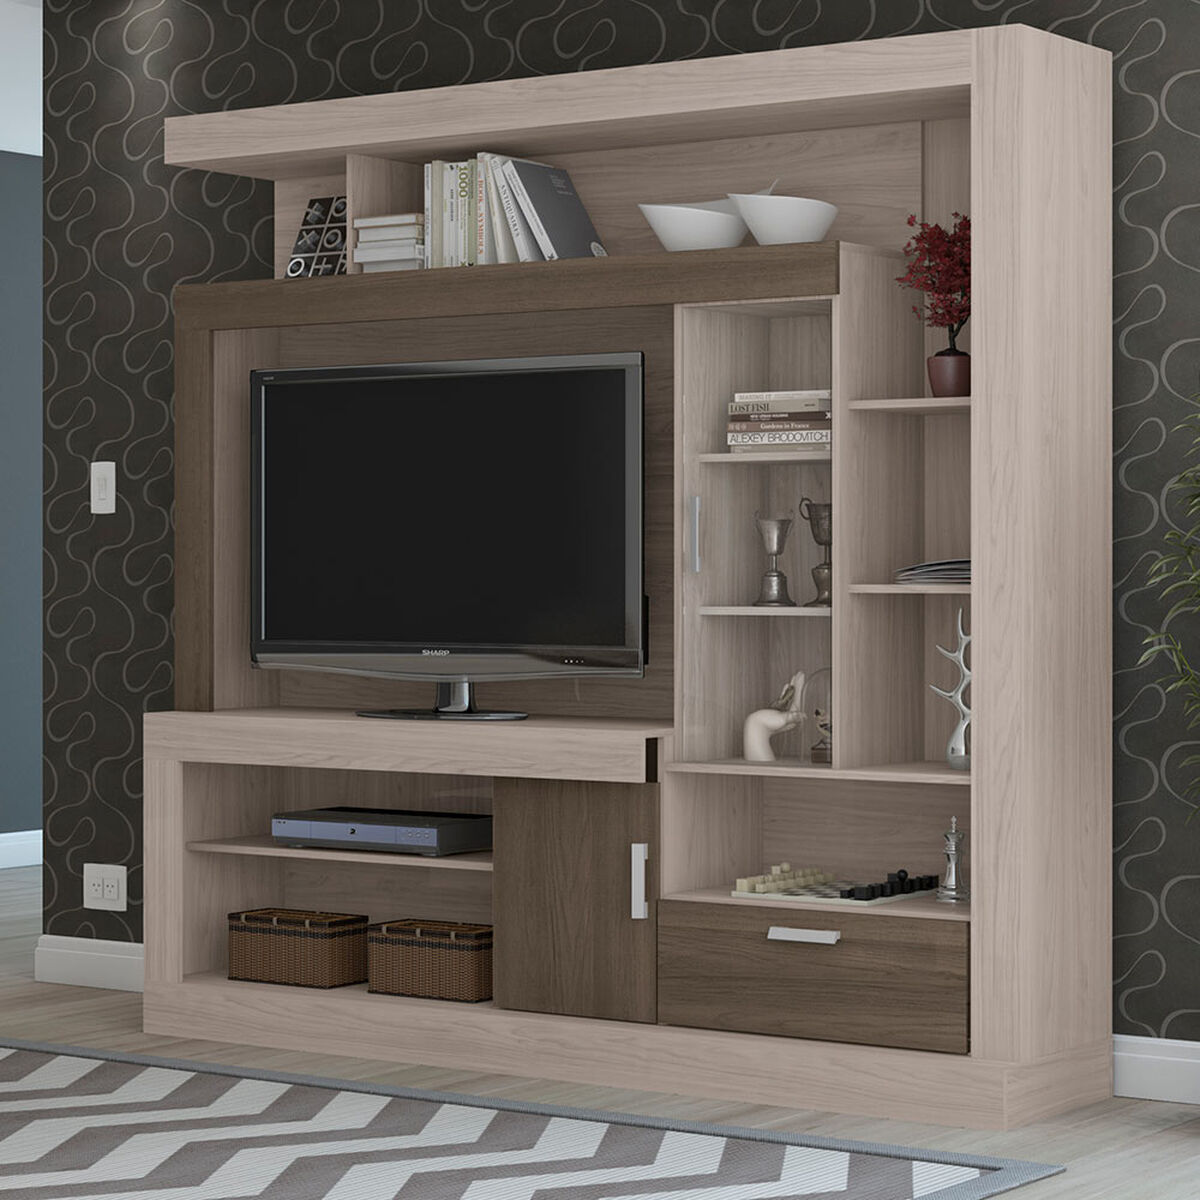 "Home TV Florencia Hasta 54"""